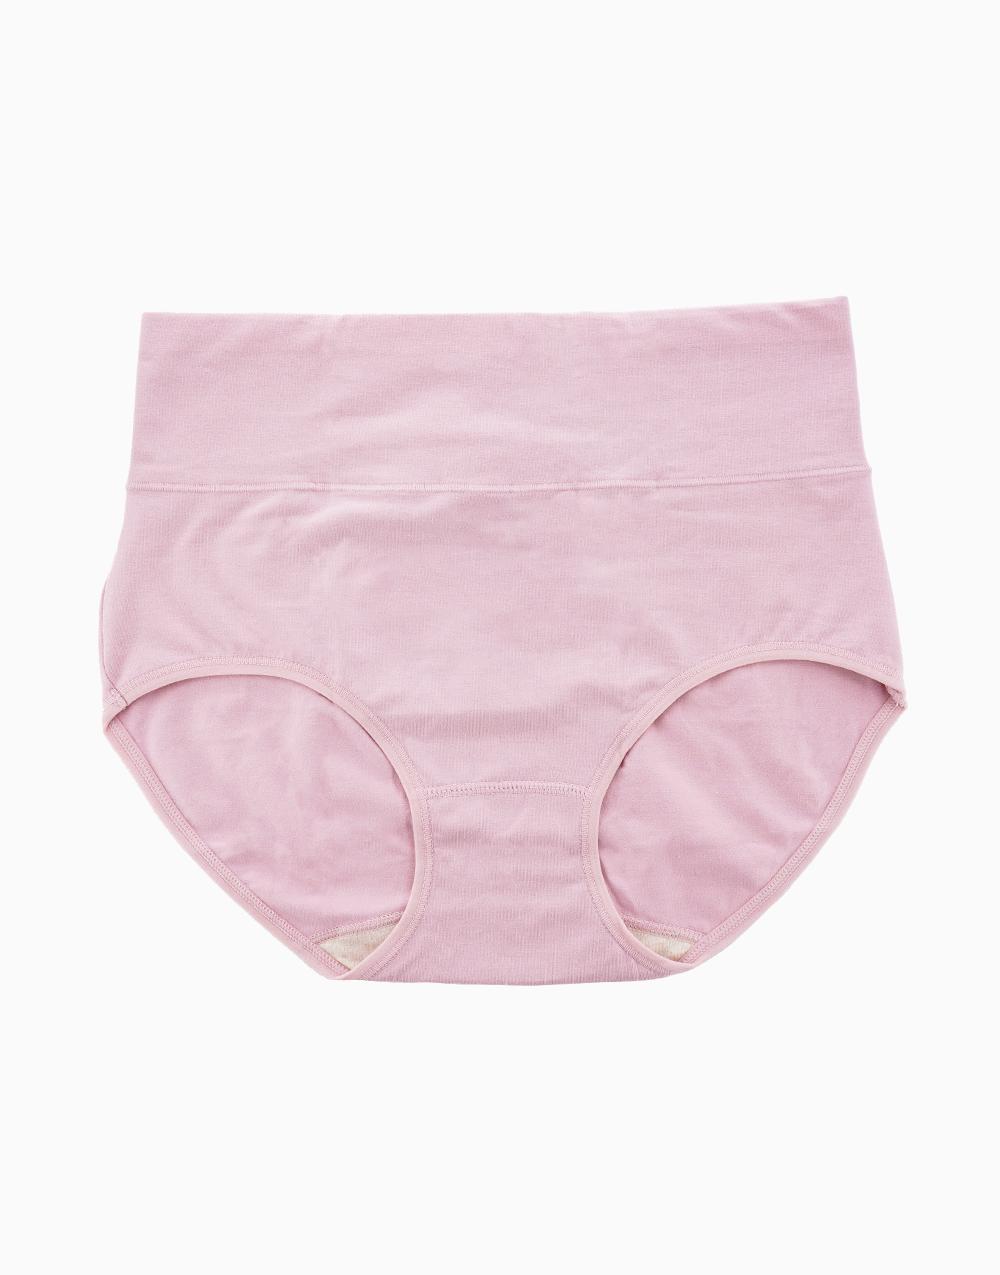 Belly Bikinis in Blush Pink (Set of 3 High Rise Control Panties) by Jellyfit   Medium